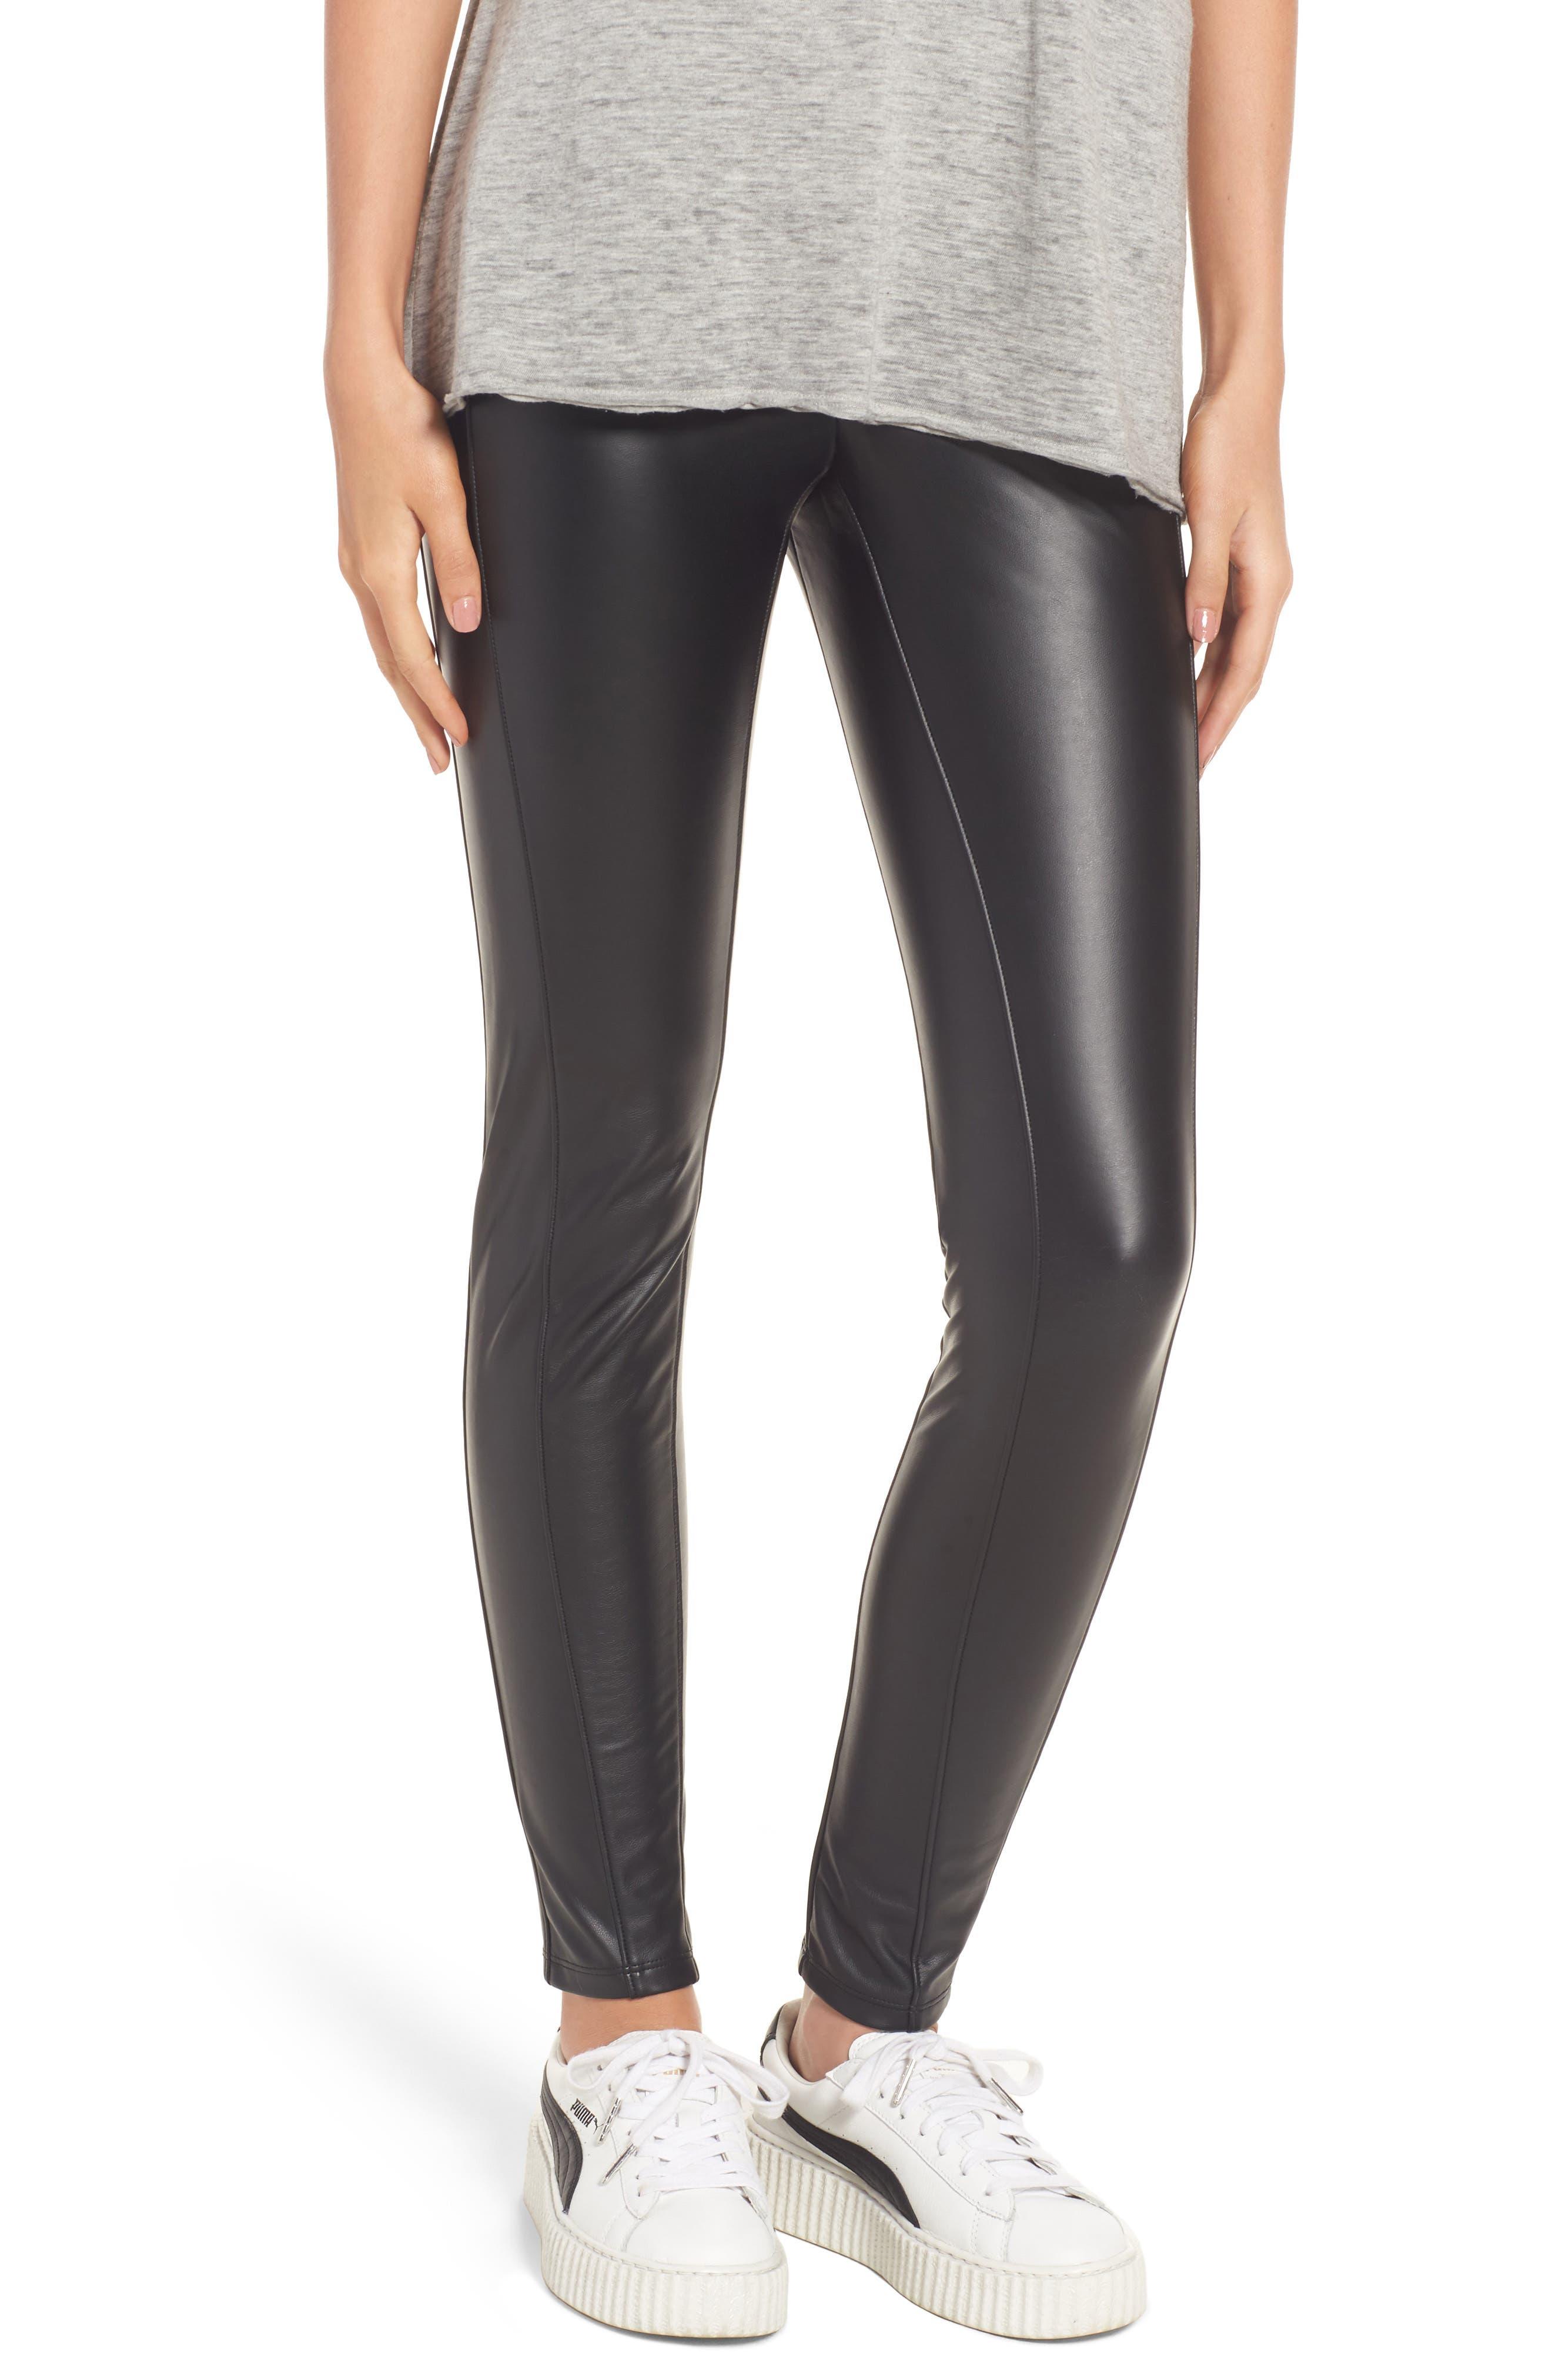 Bryce High Waist Faux Leather Leggings,                             Main thumbnail 1, color,                             Black